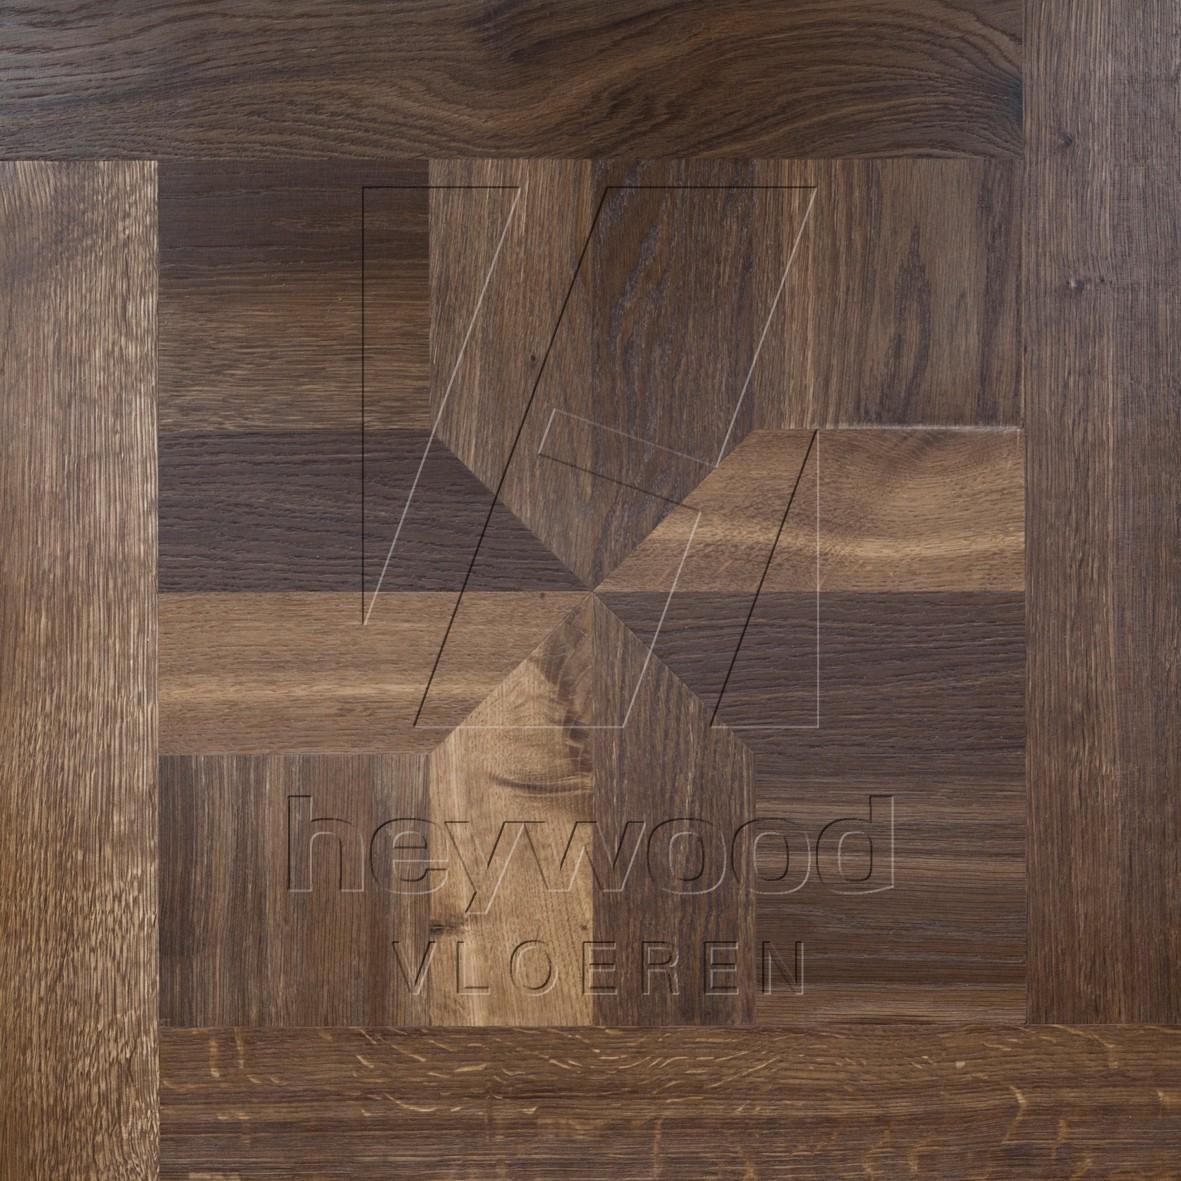 Variance Panel in Floor & Wall Panels of Pattern & Panel Floors